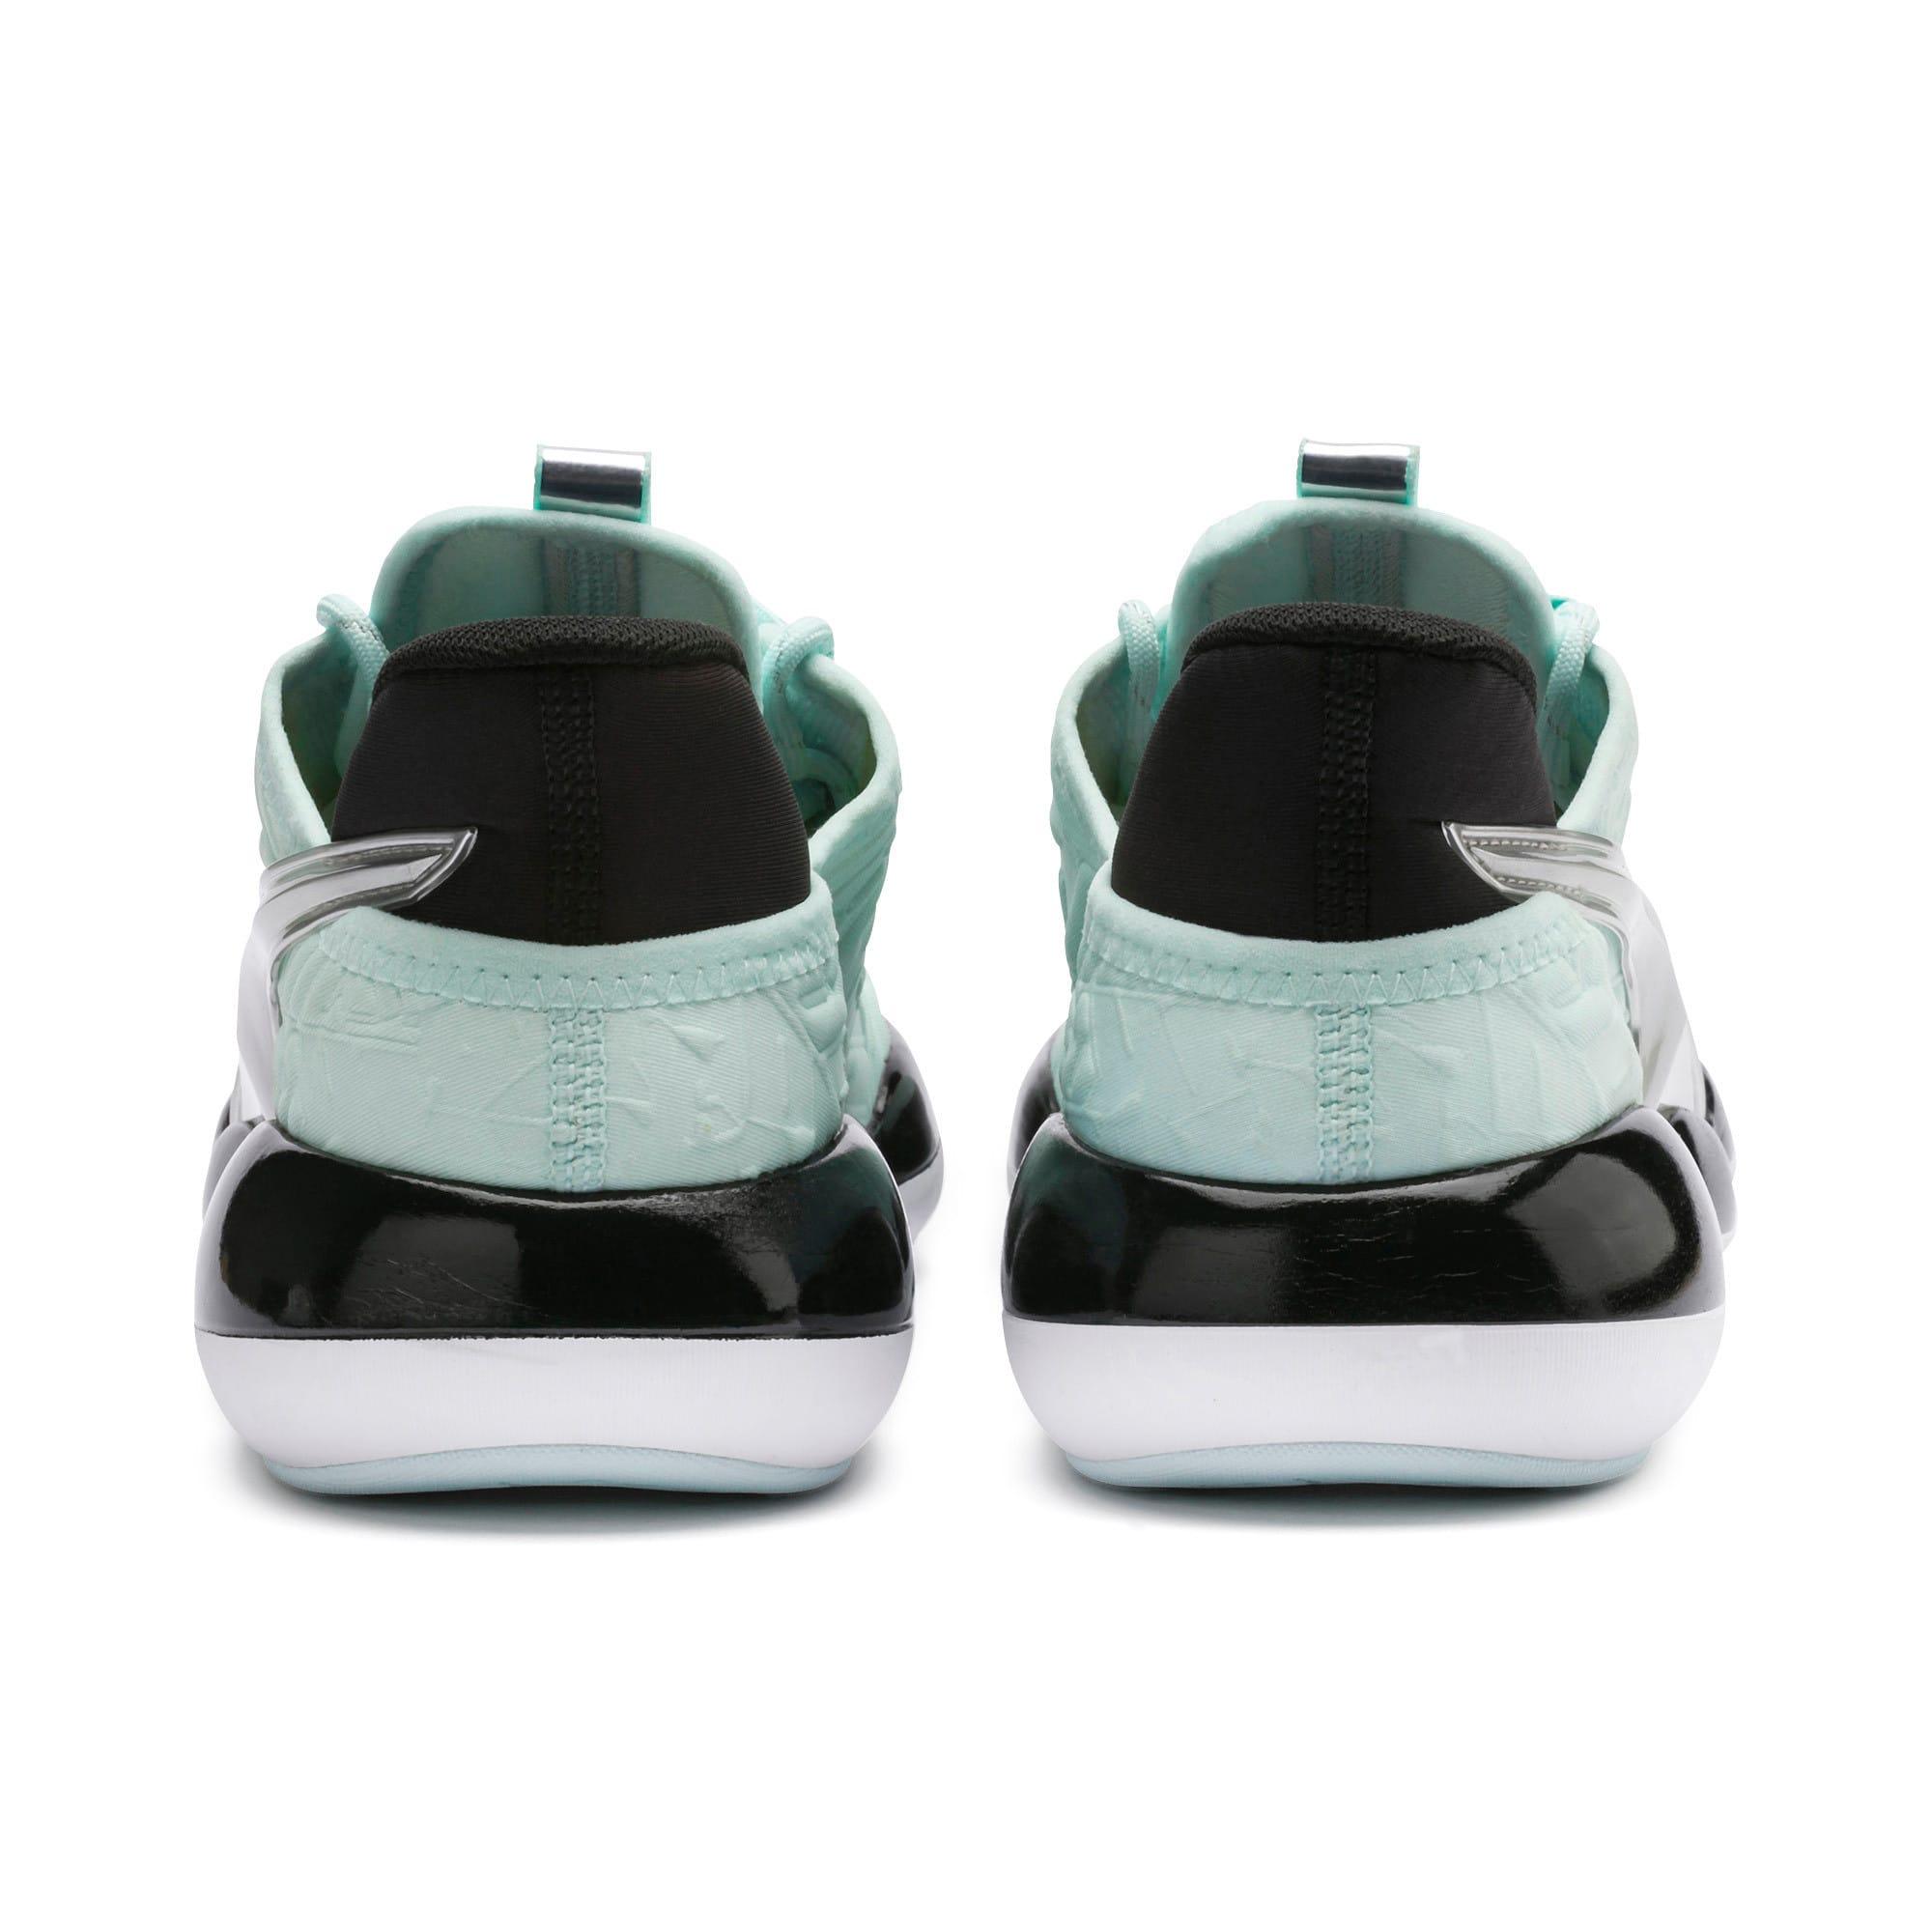 Thumbnail 4 of Mode XT Trailblazer Women's Training Shoes, Fair Aqua-Puma White, medium